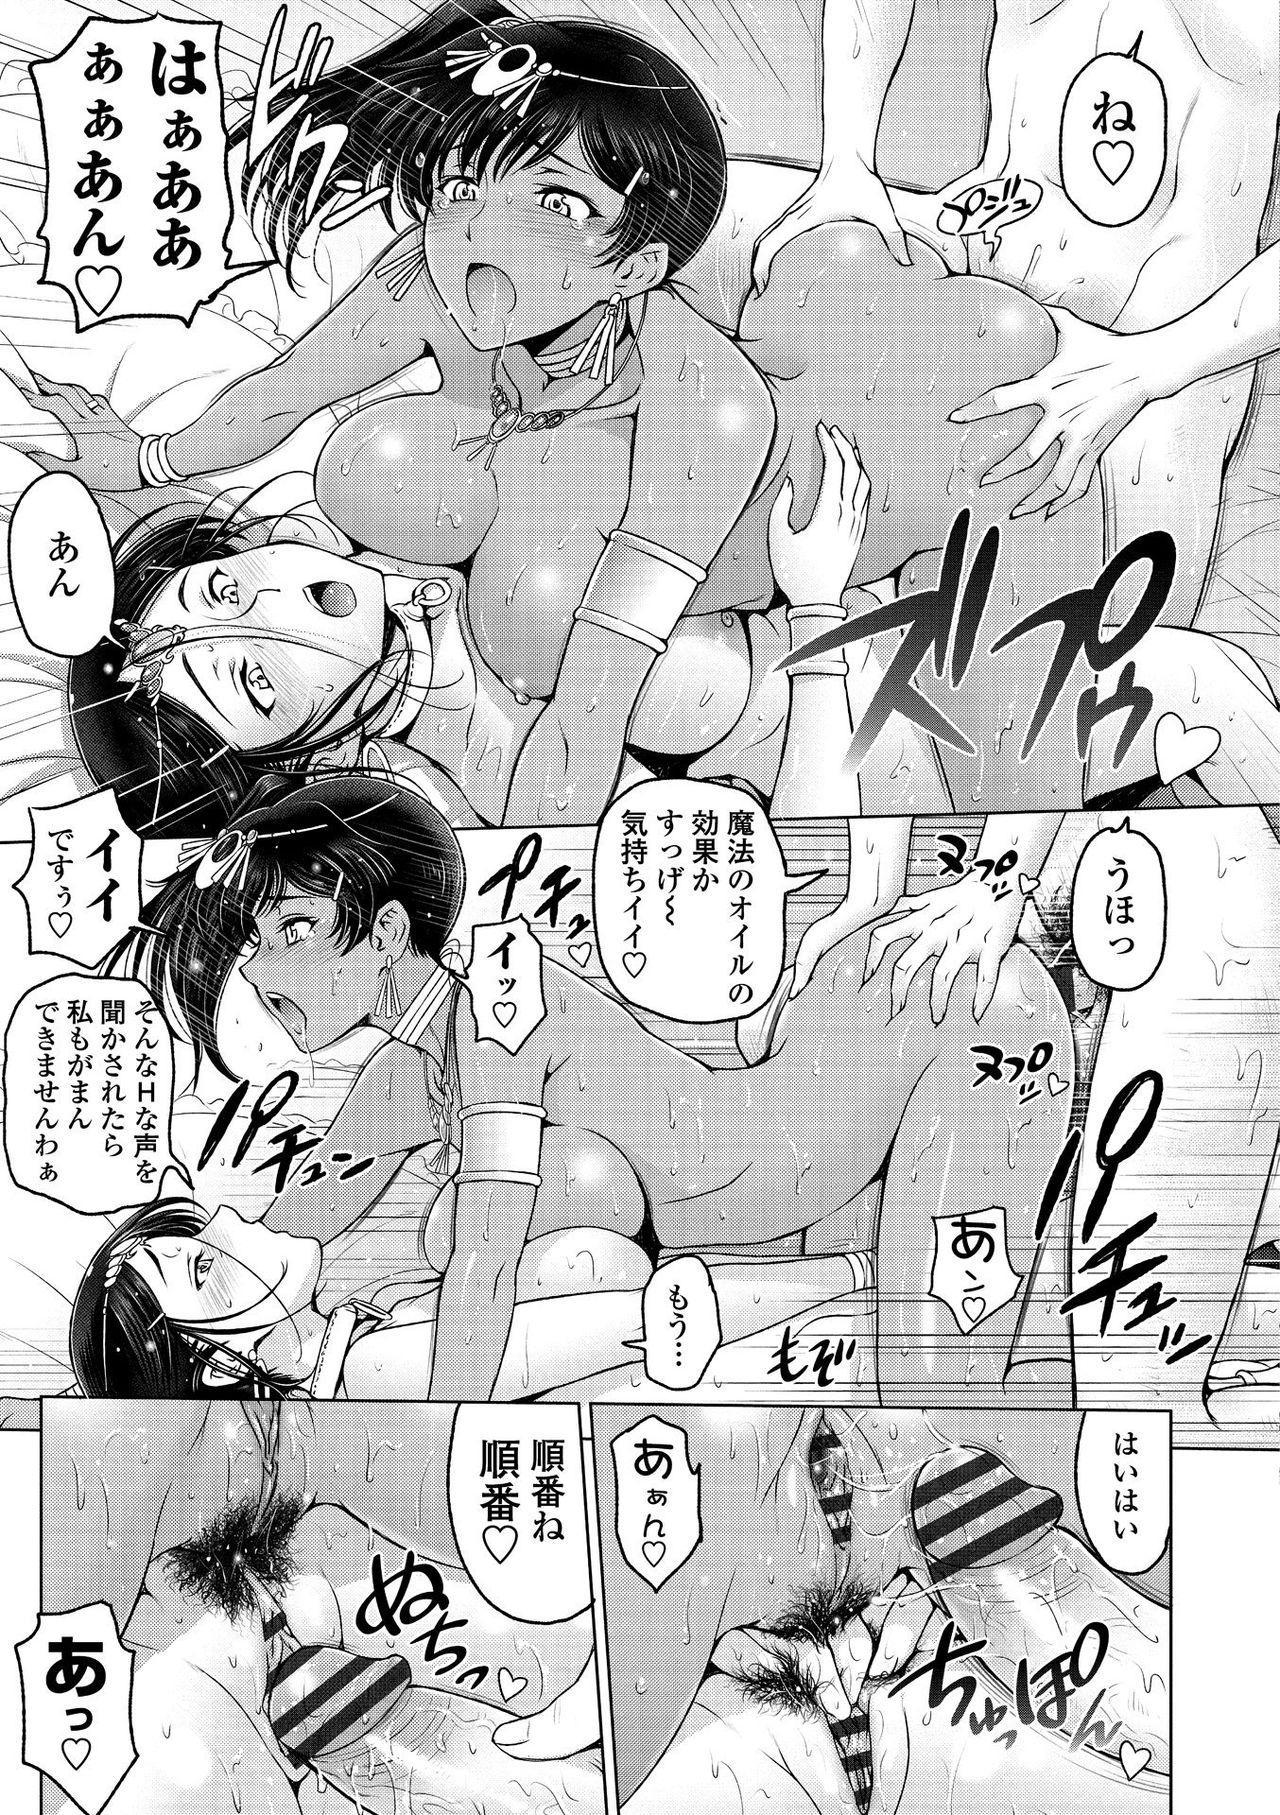 Dosukebe Onei-chan 220